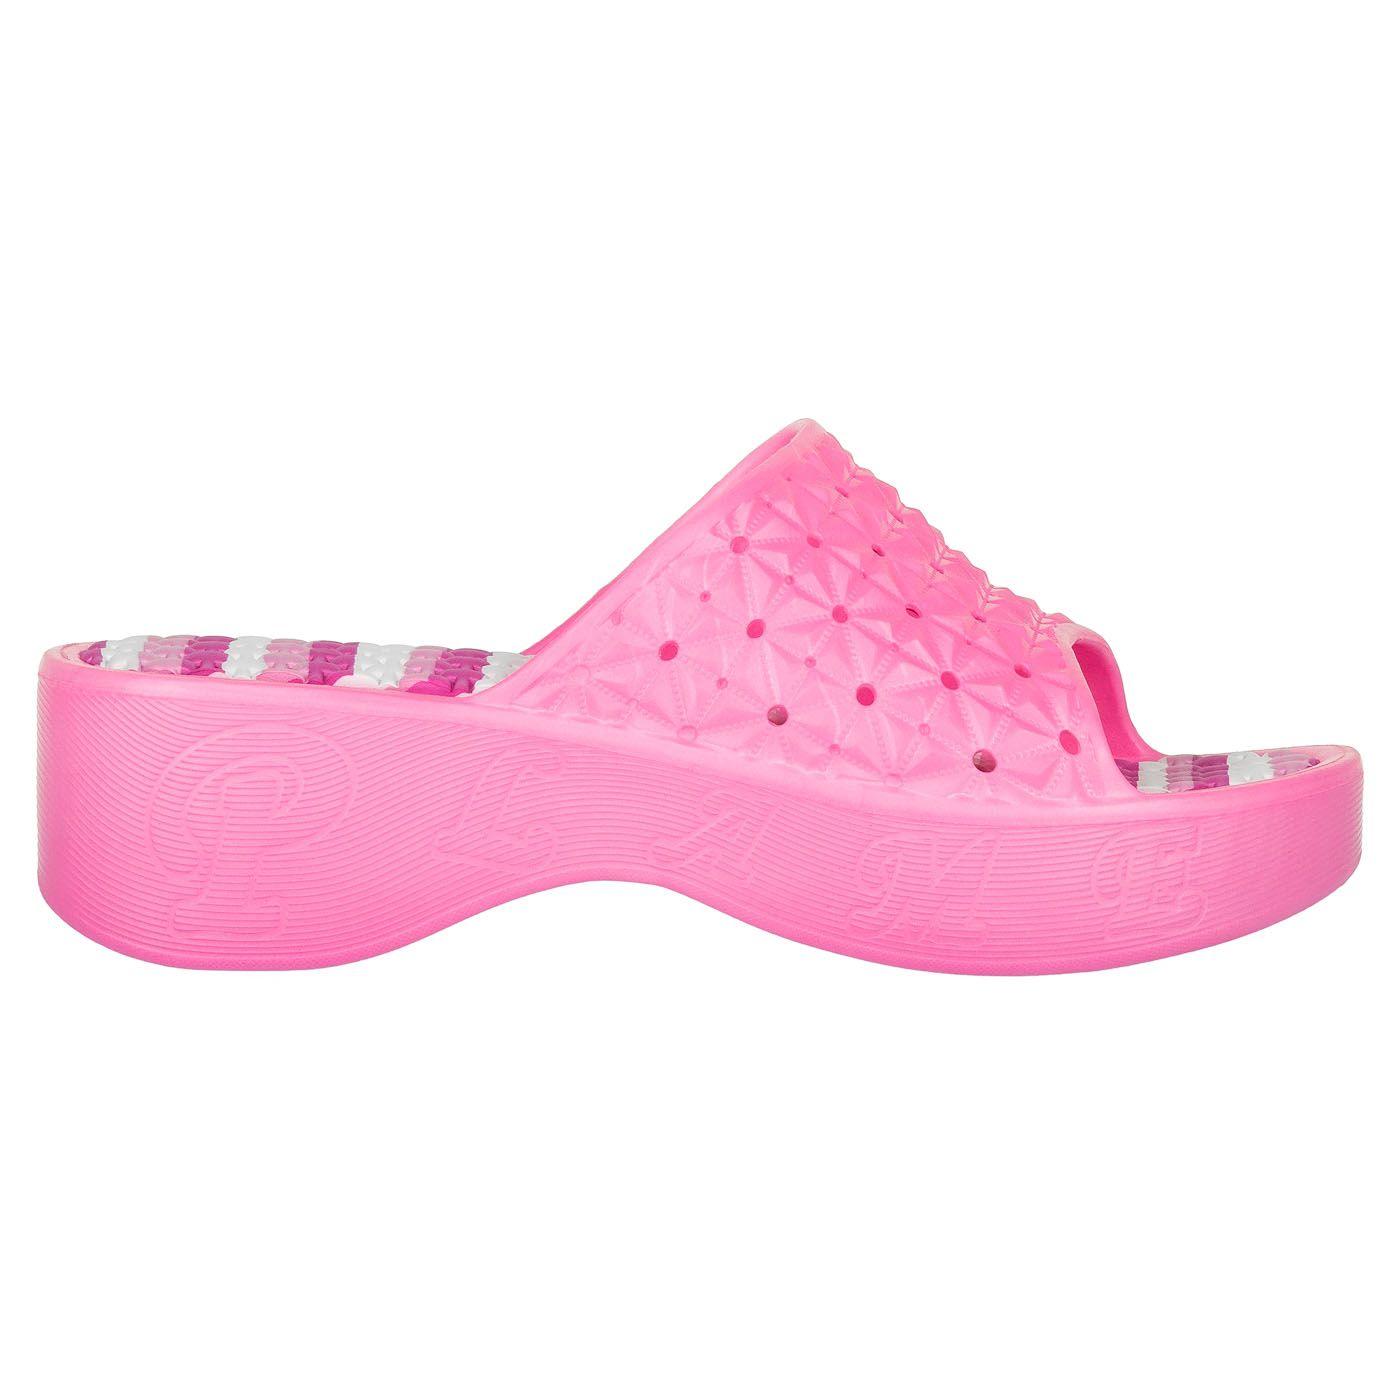 Women's slides FLAMEshoes B2018